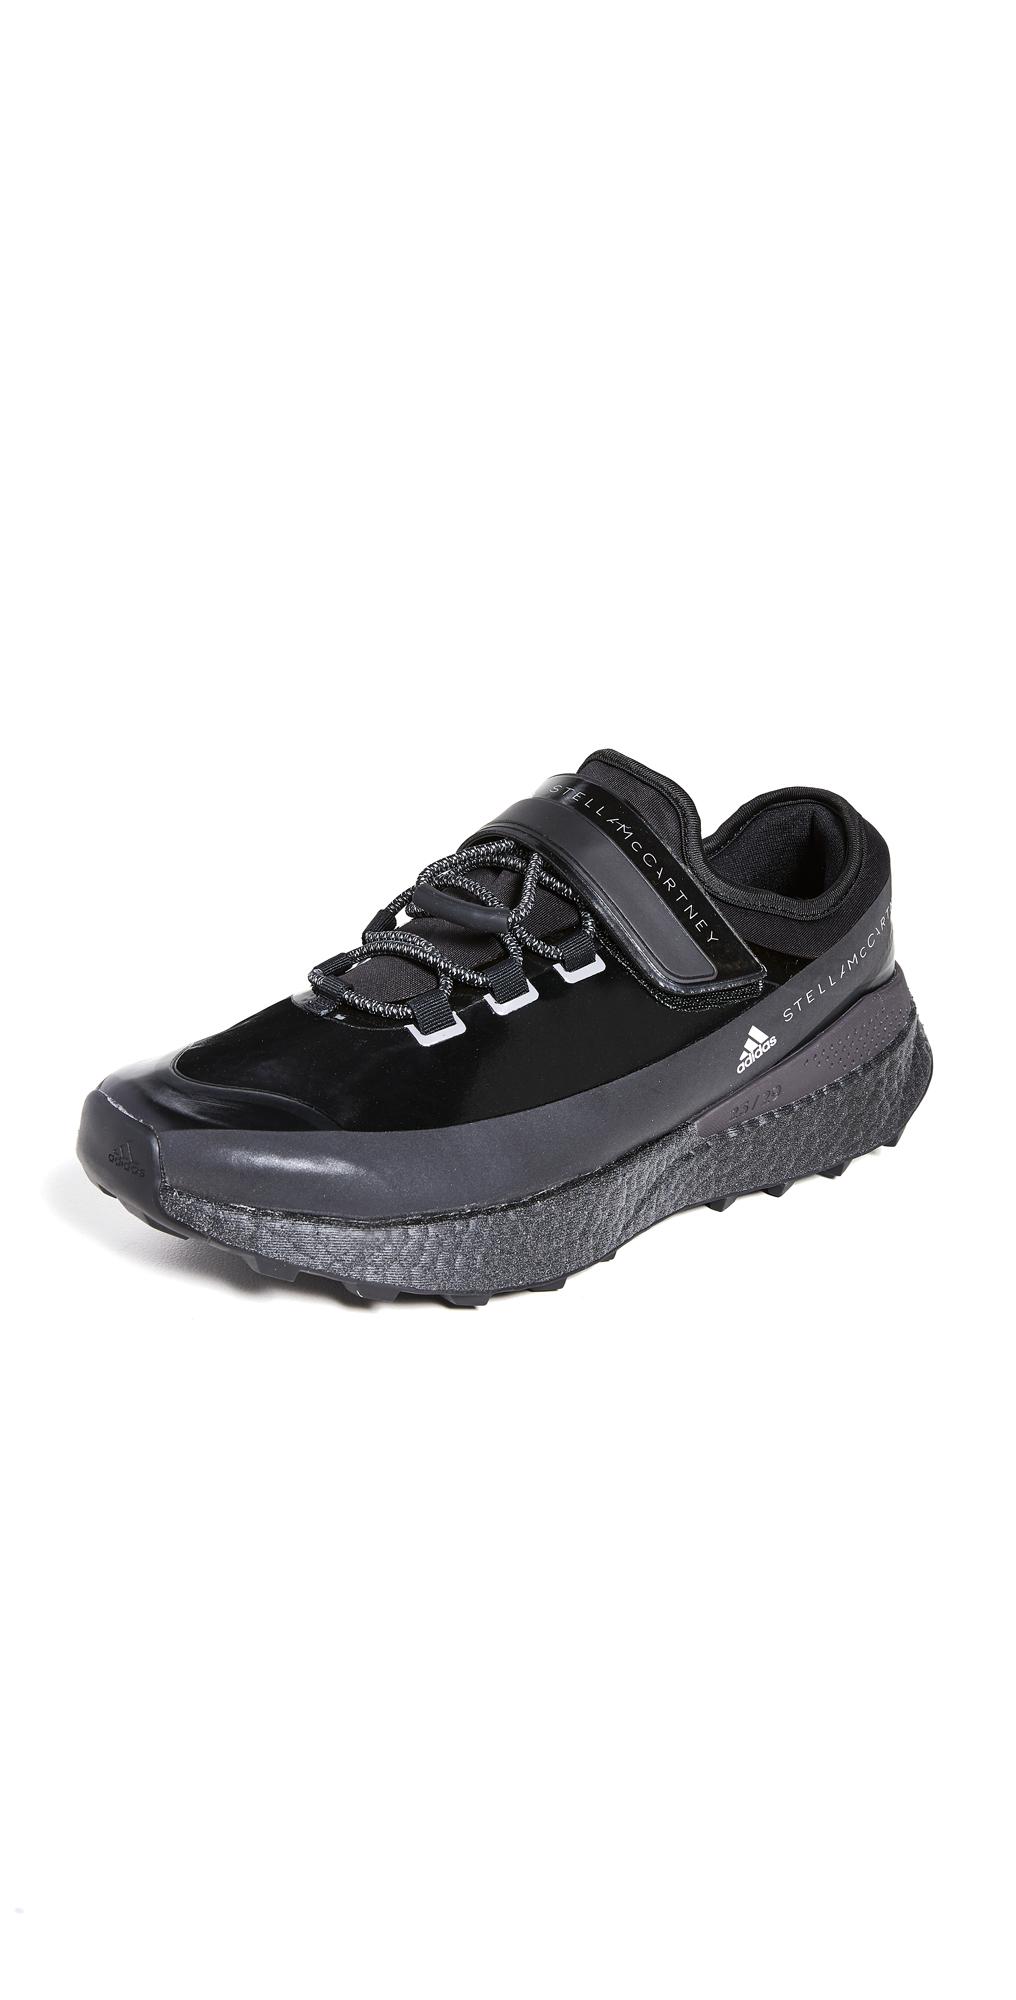 adidas by Stella McCartney Outdoor Boost Rain. Rdy Shoes